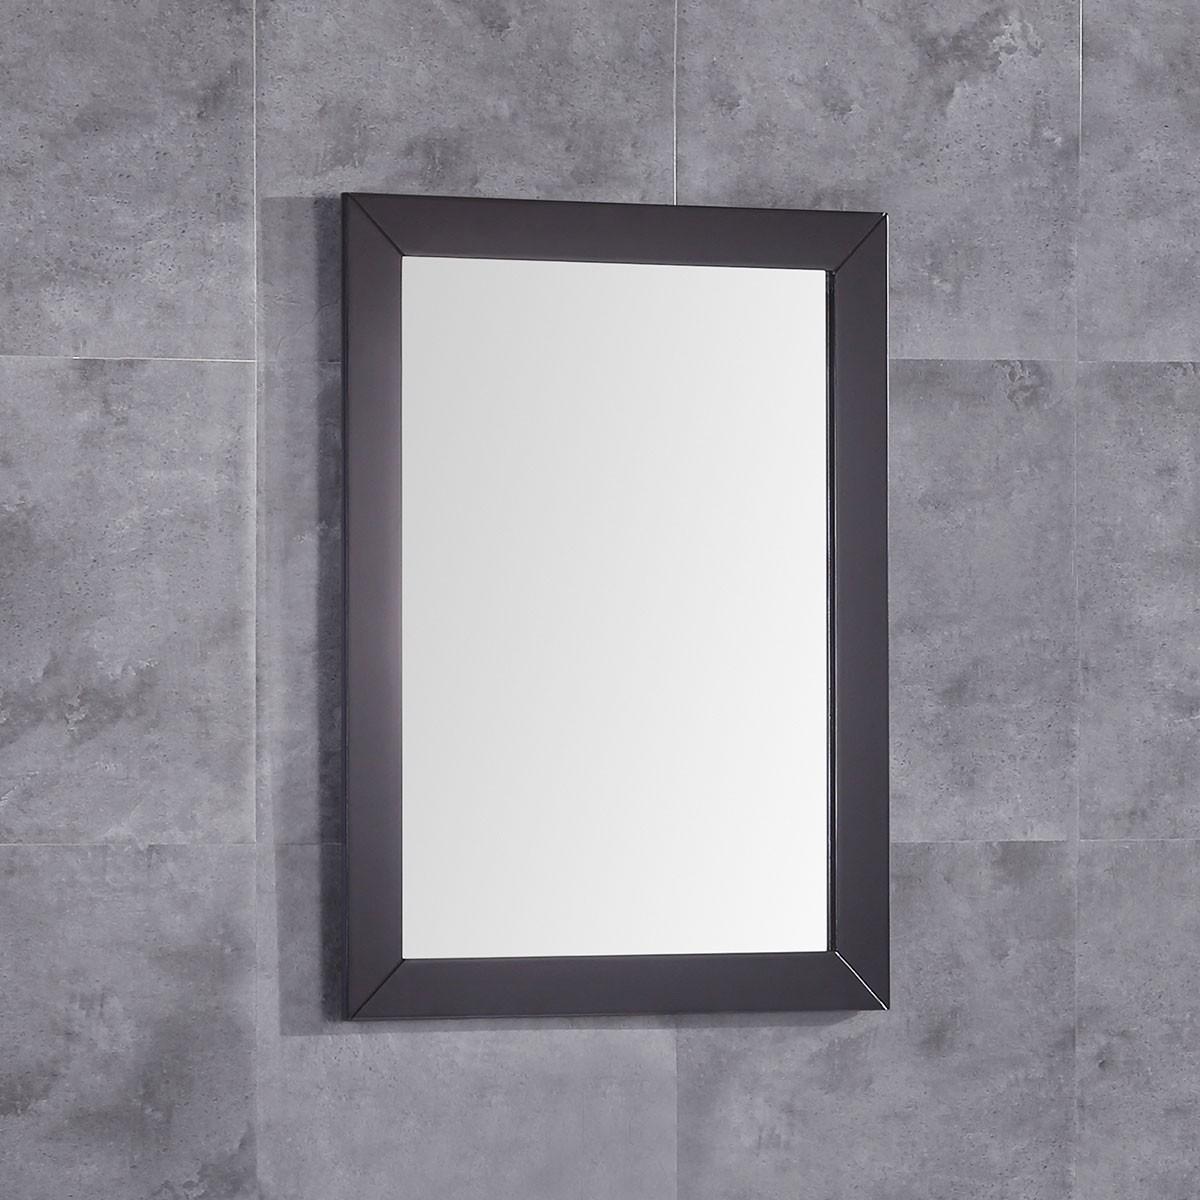 24 x 32 In. Wood Frame Mirror (DK-T9190-M)